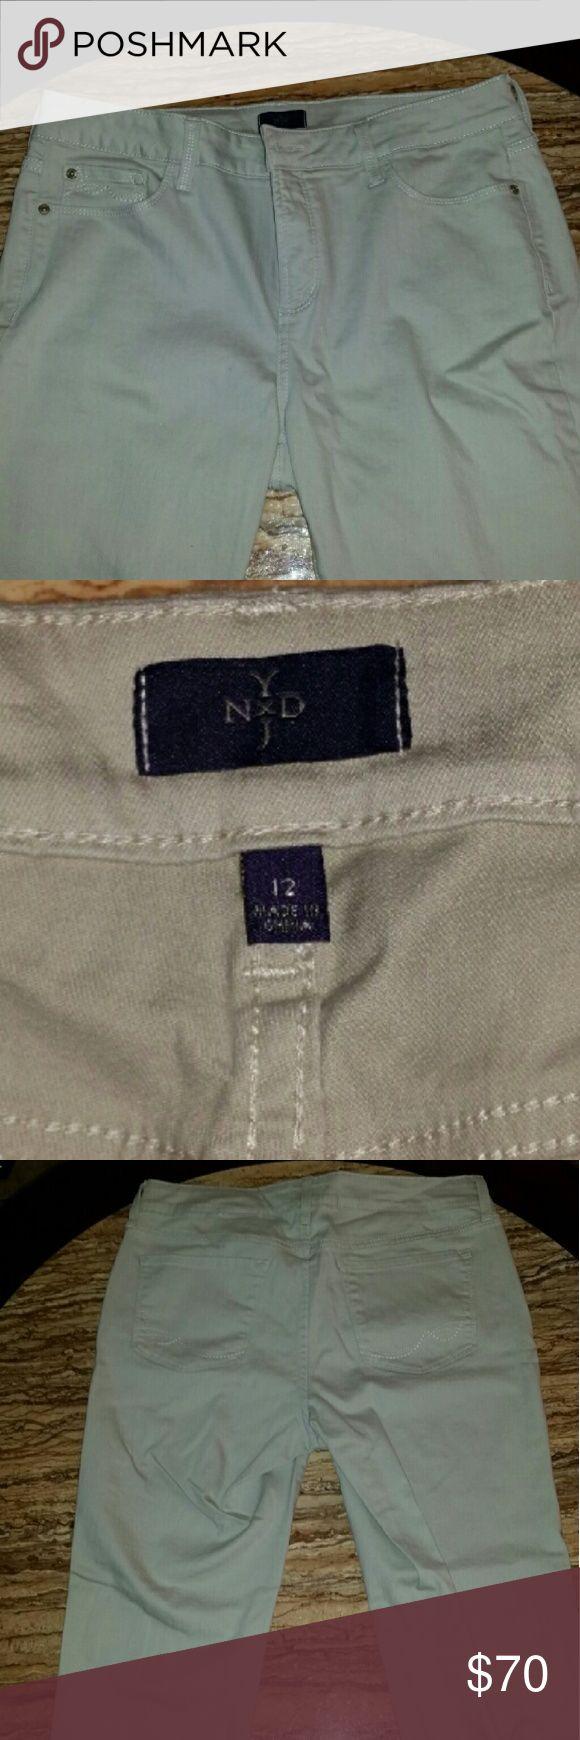 Womens jeans Nydj. Khaki color. Size 12. Like new NYDJ Jeans Straight Leg